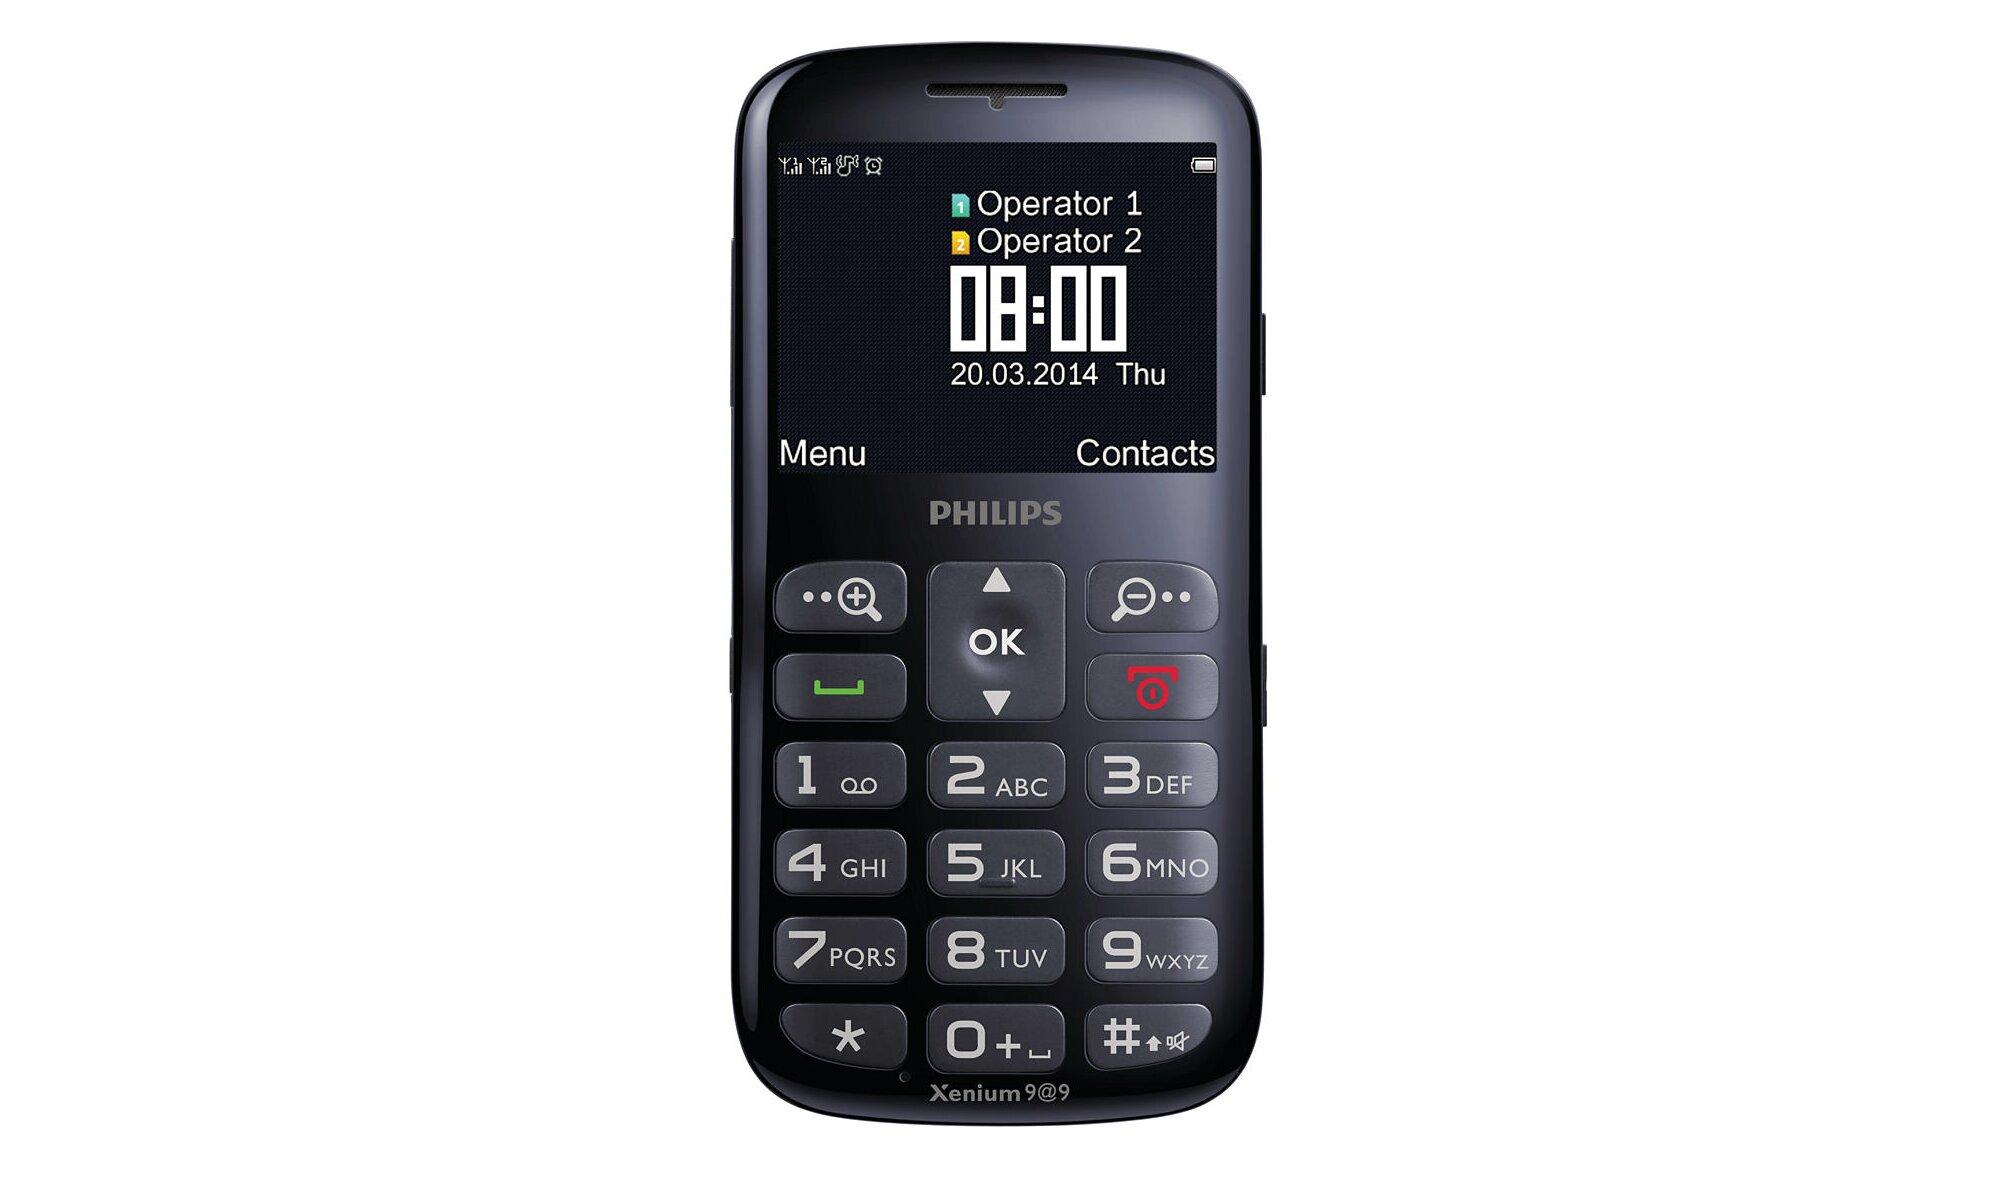 Điện thoại Philips Xenium X2566 - 2 sim